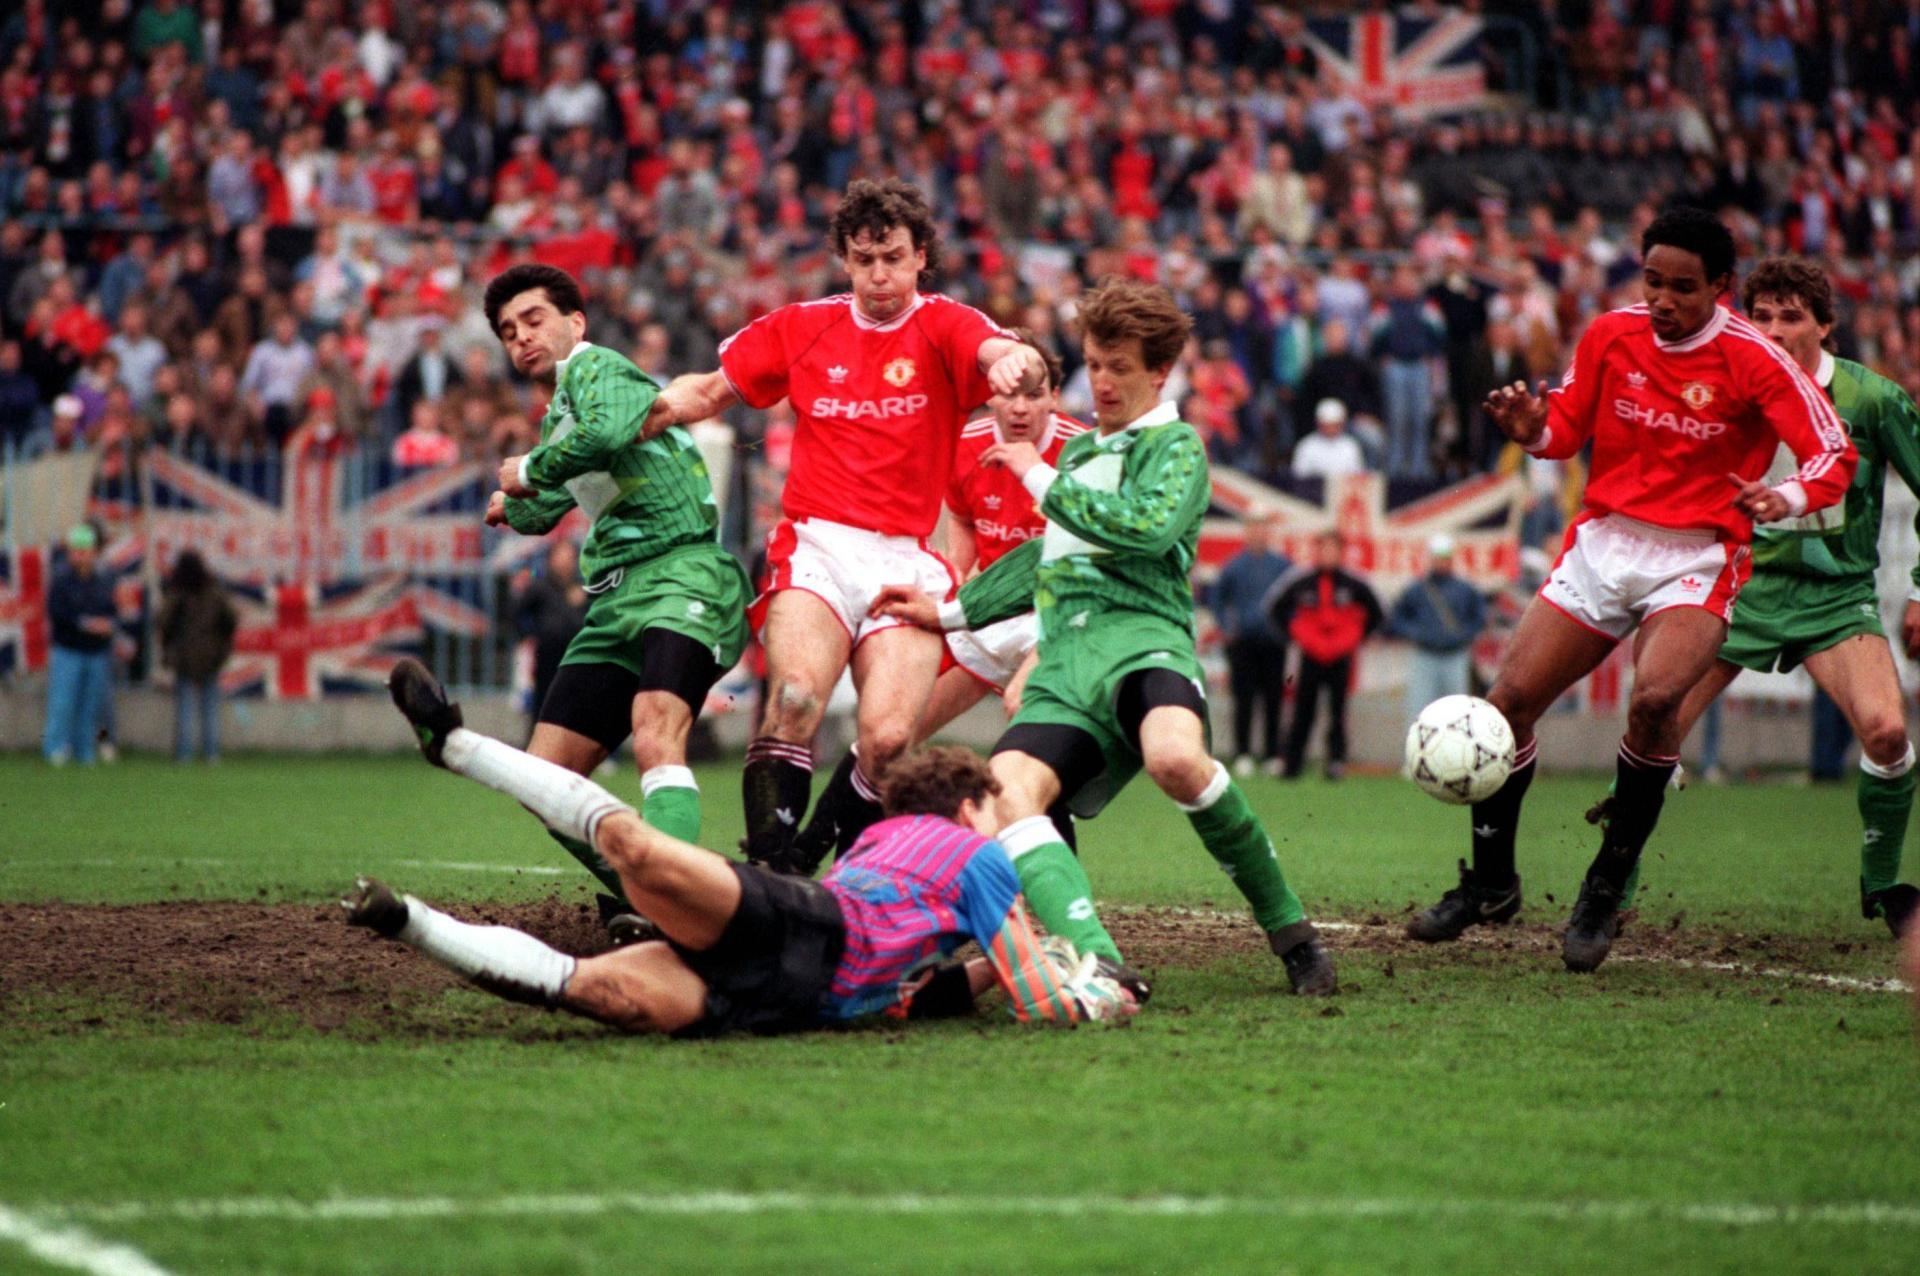 Mark Hughes podczas meczu Legia Warszawa - Manchester United 1:3 (10.04.1991).